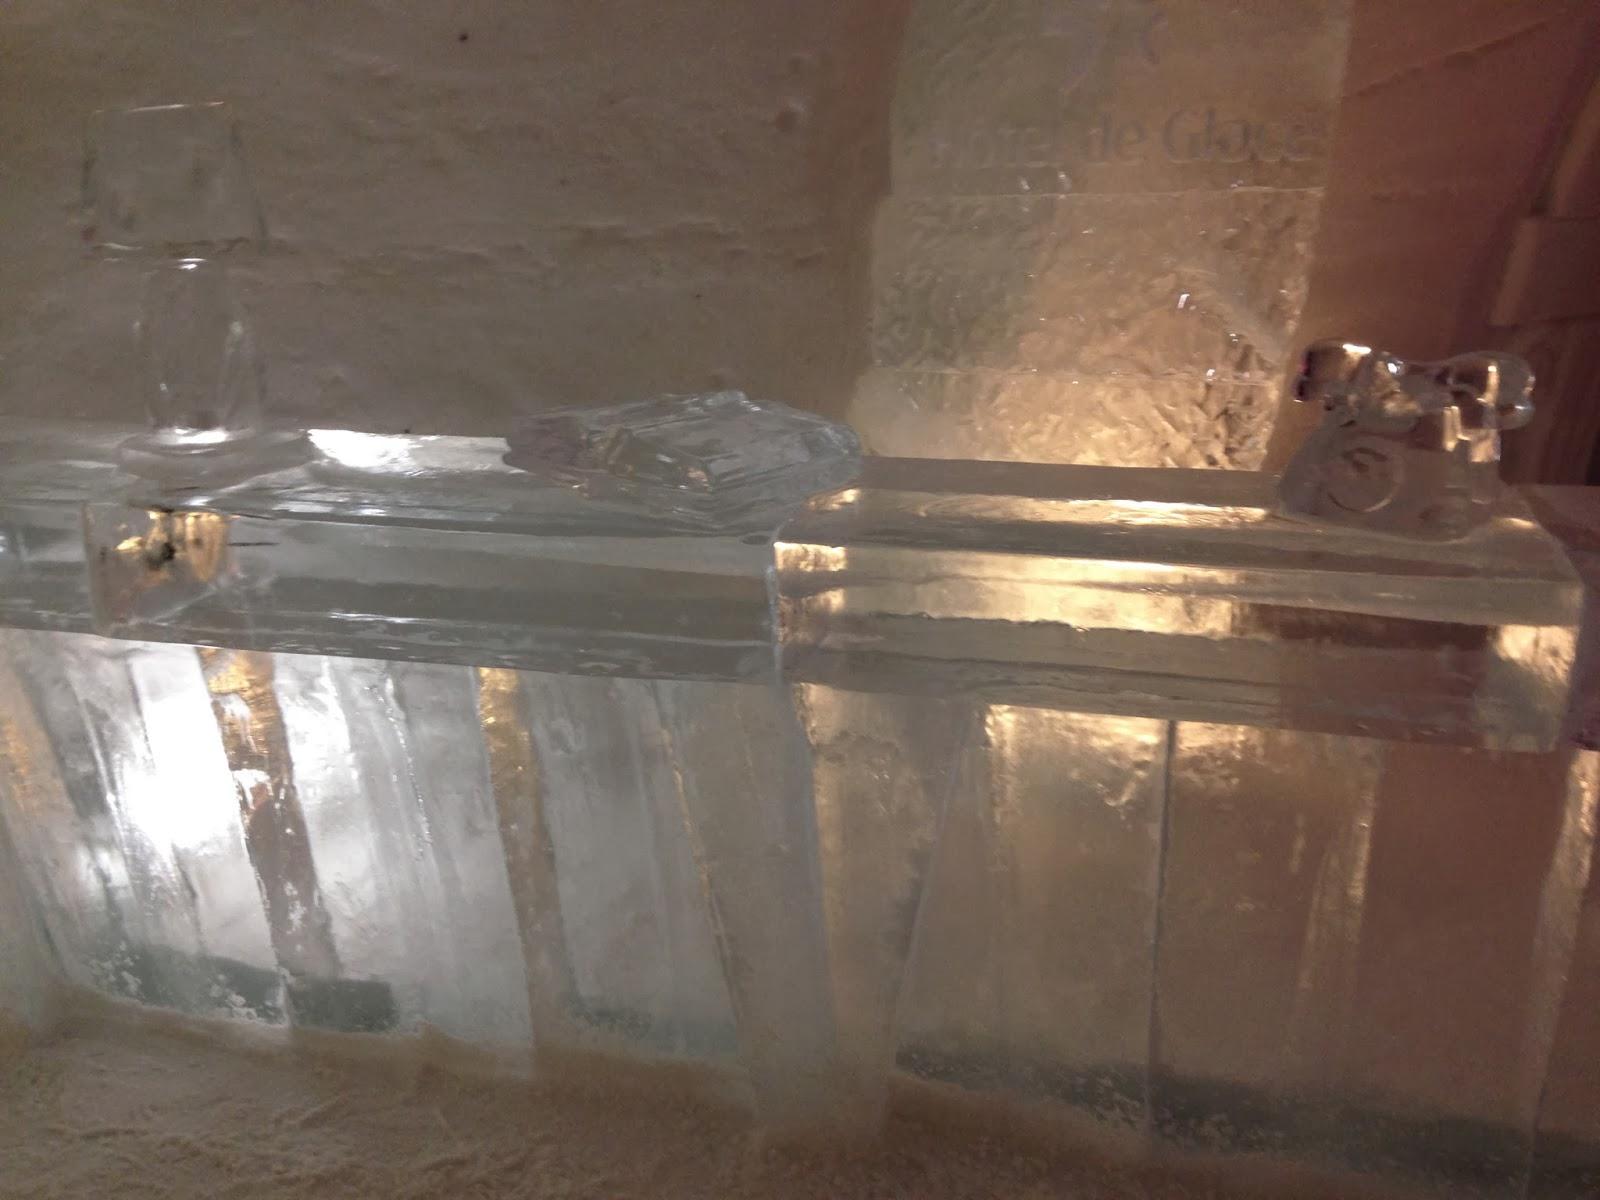 Hotel De Glace ice lobby